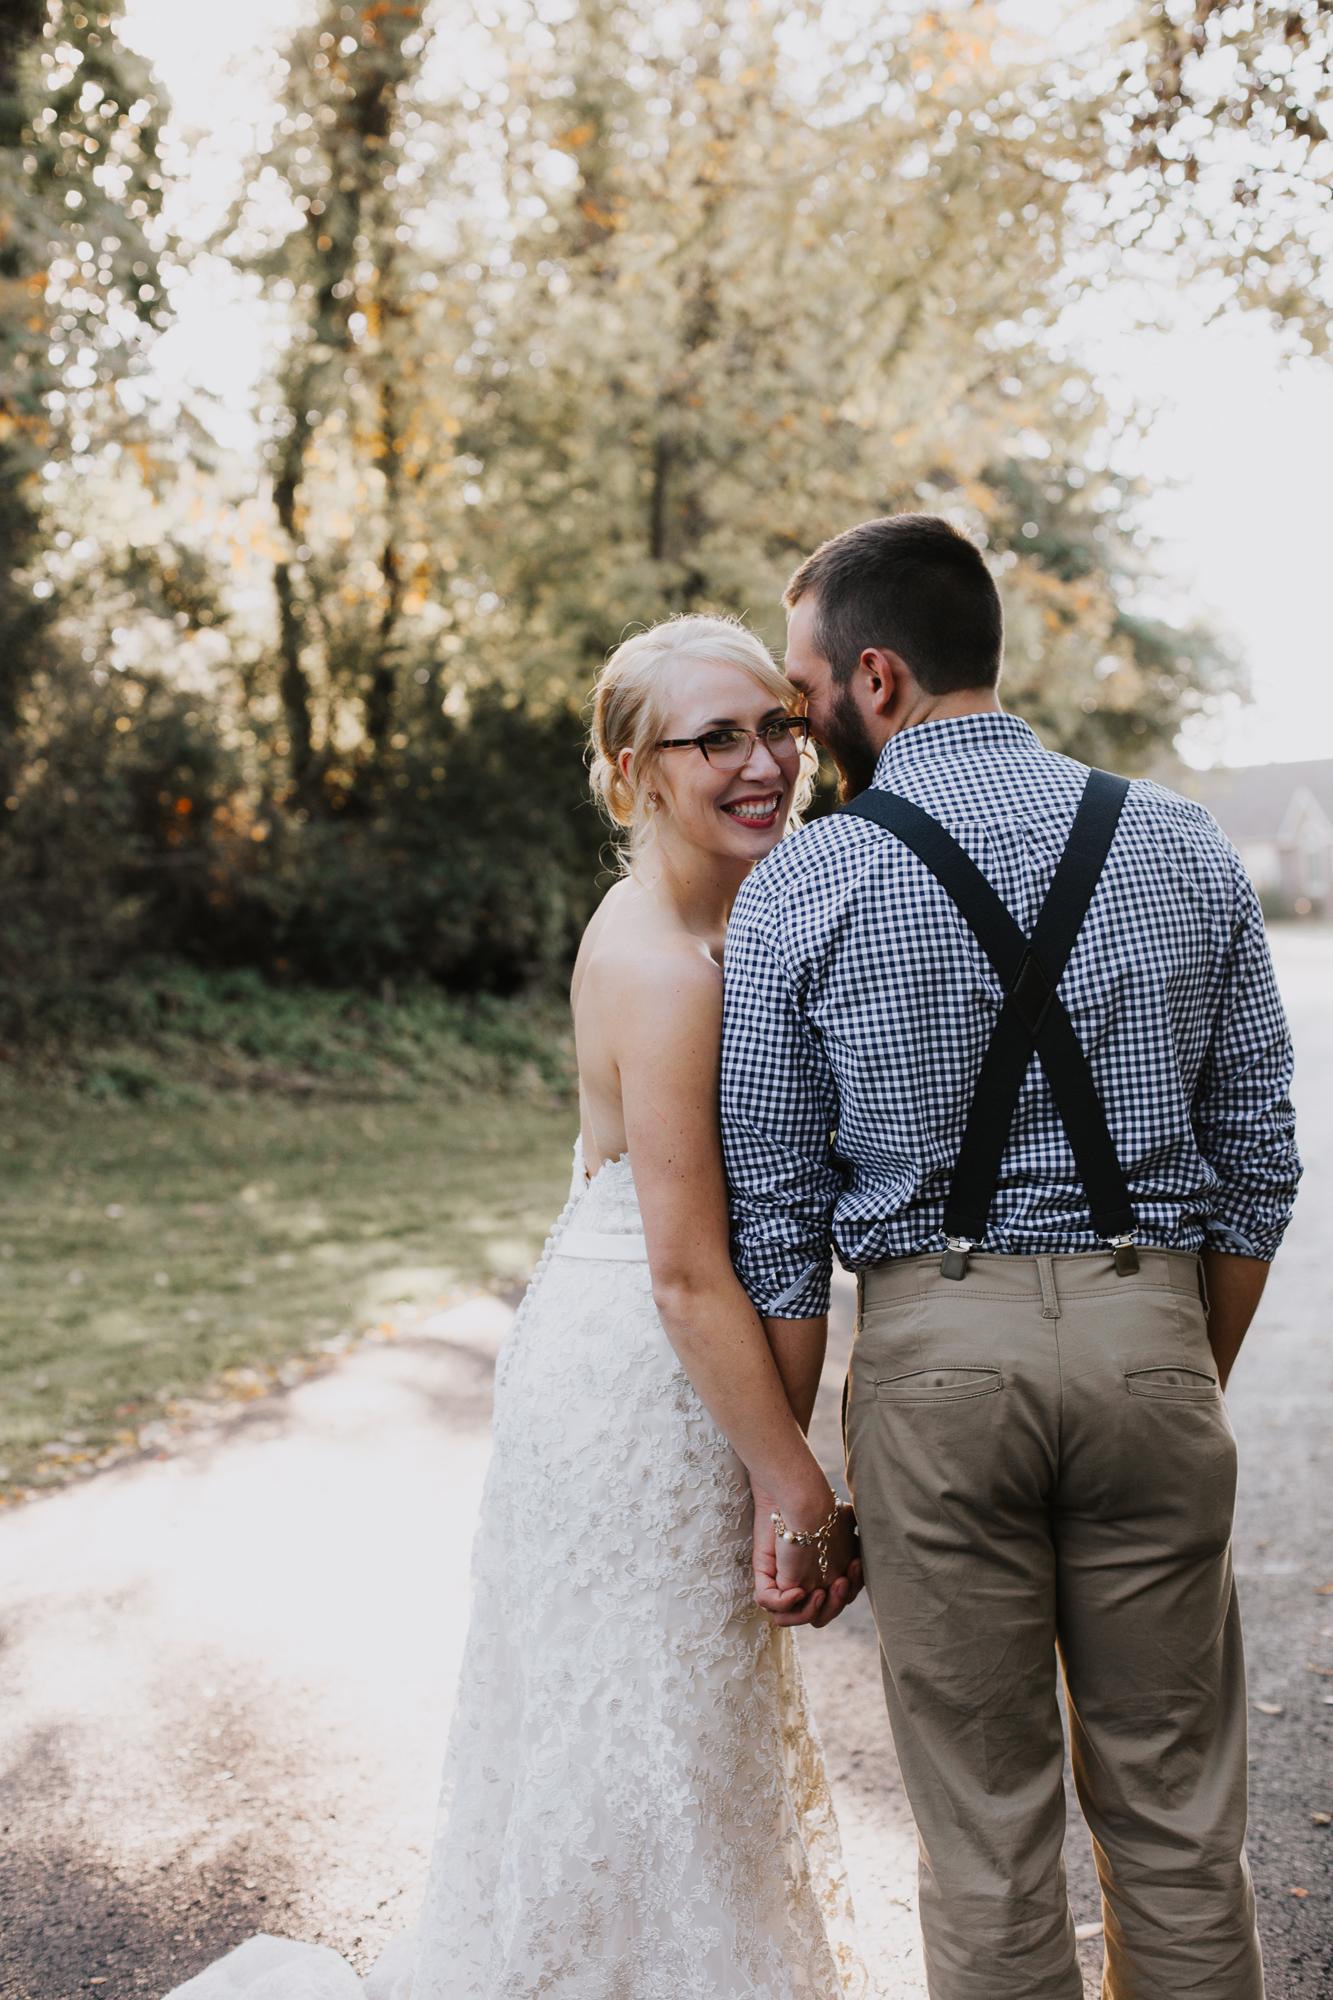 light-wedding-photography-in-lehigh-valley-region